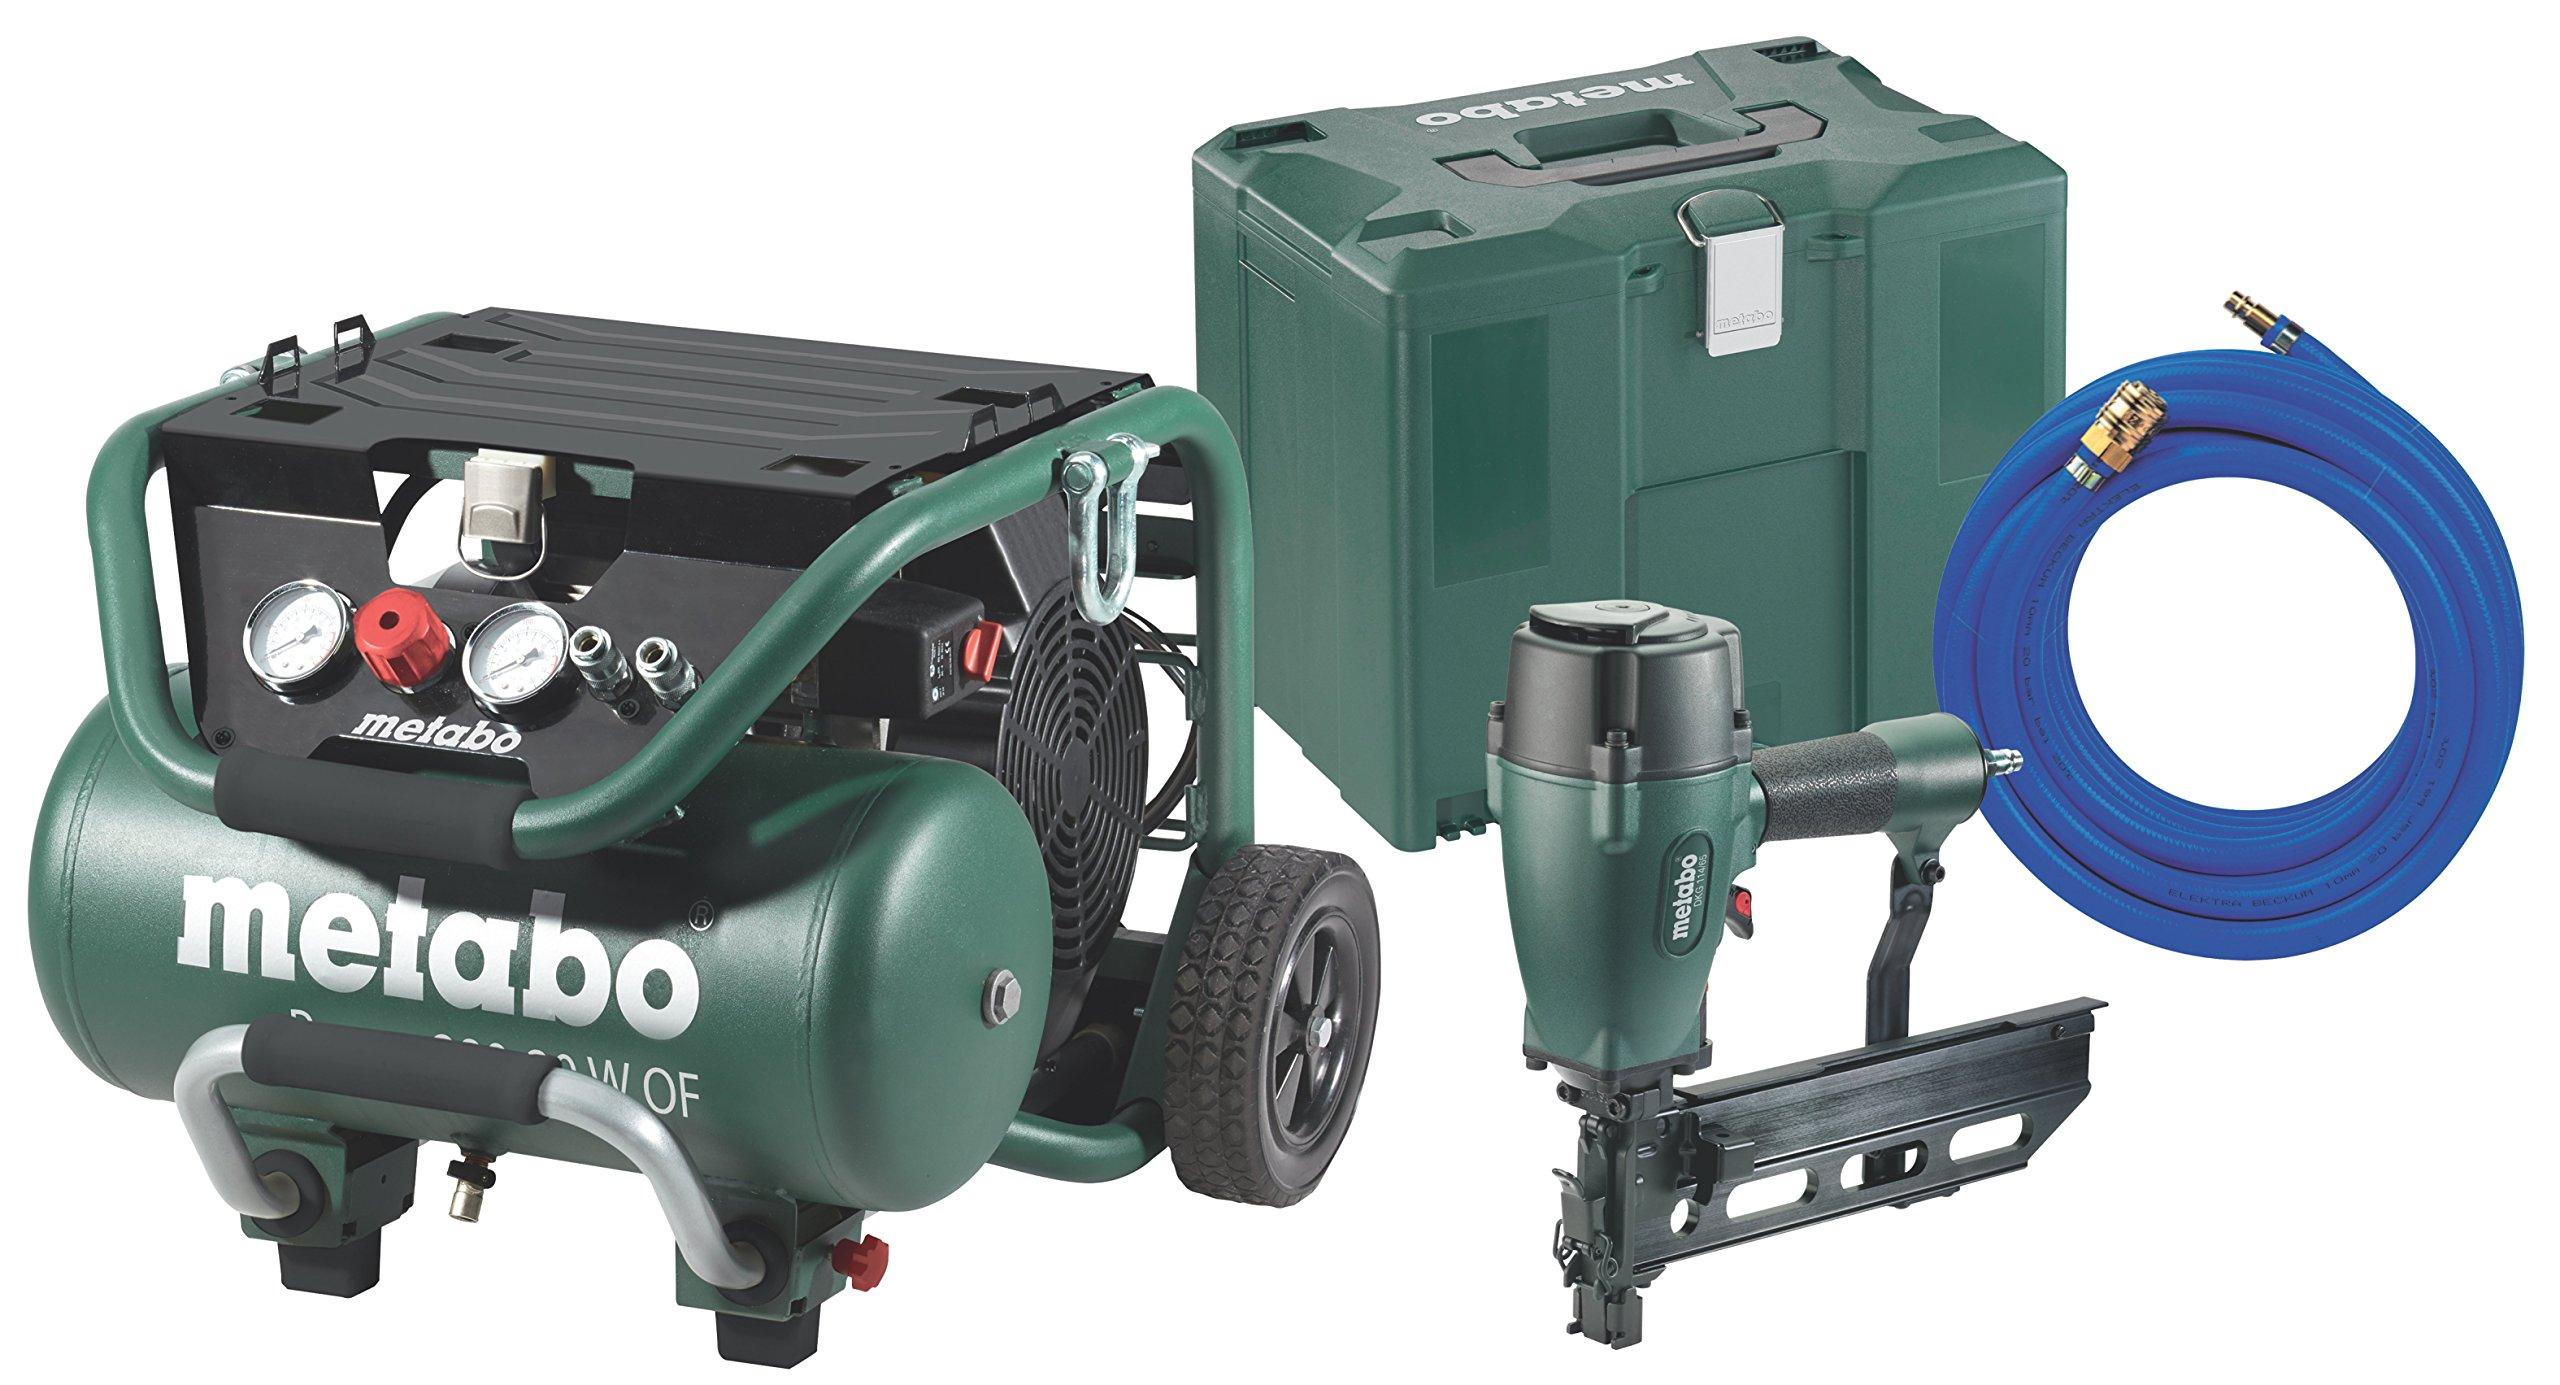 Metabo-690892000-Set-Power-400-20-W-OF-DKG-114-65-Sch